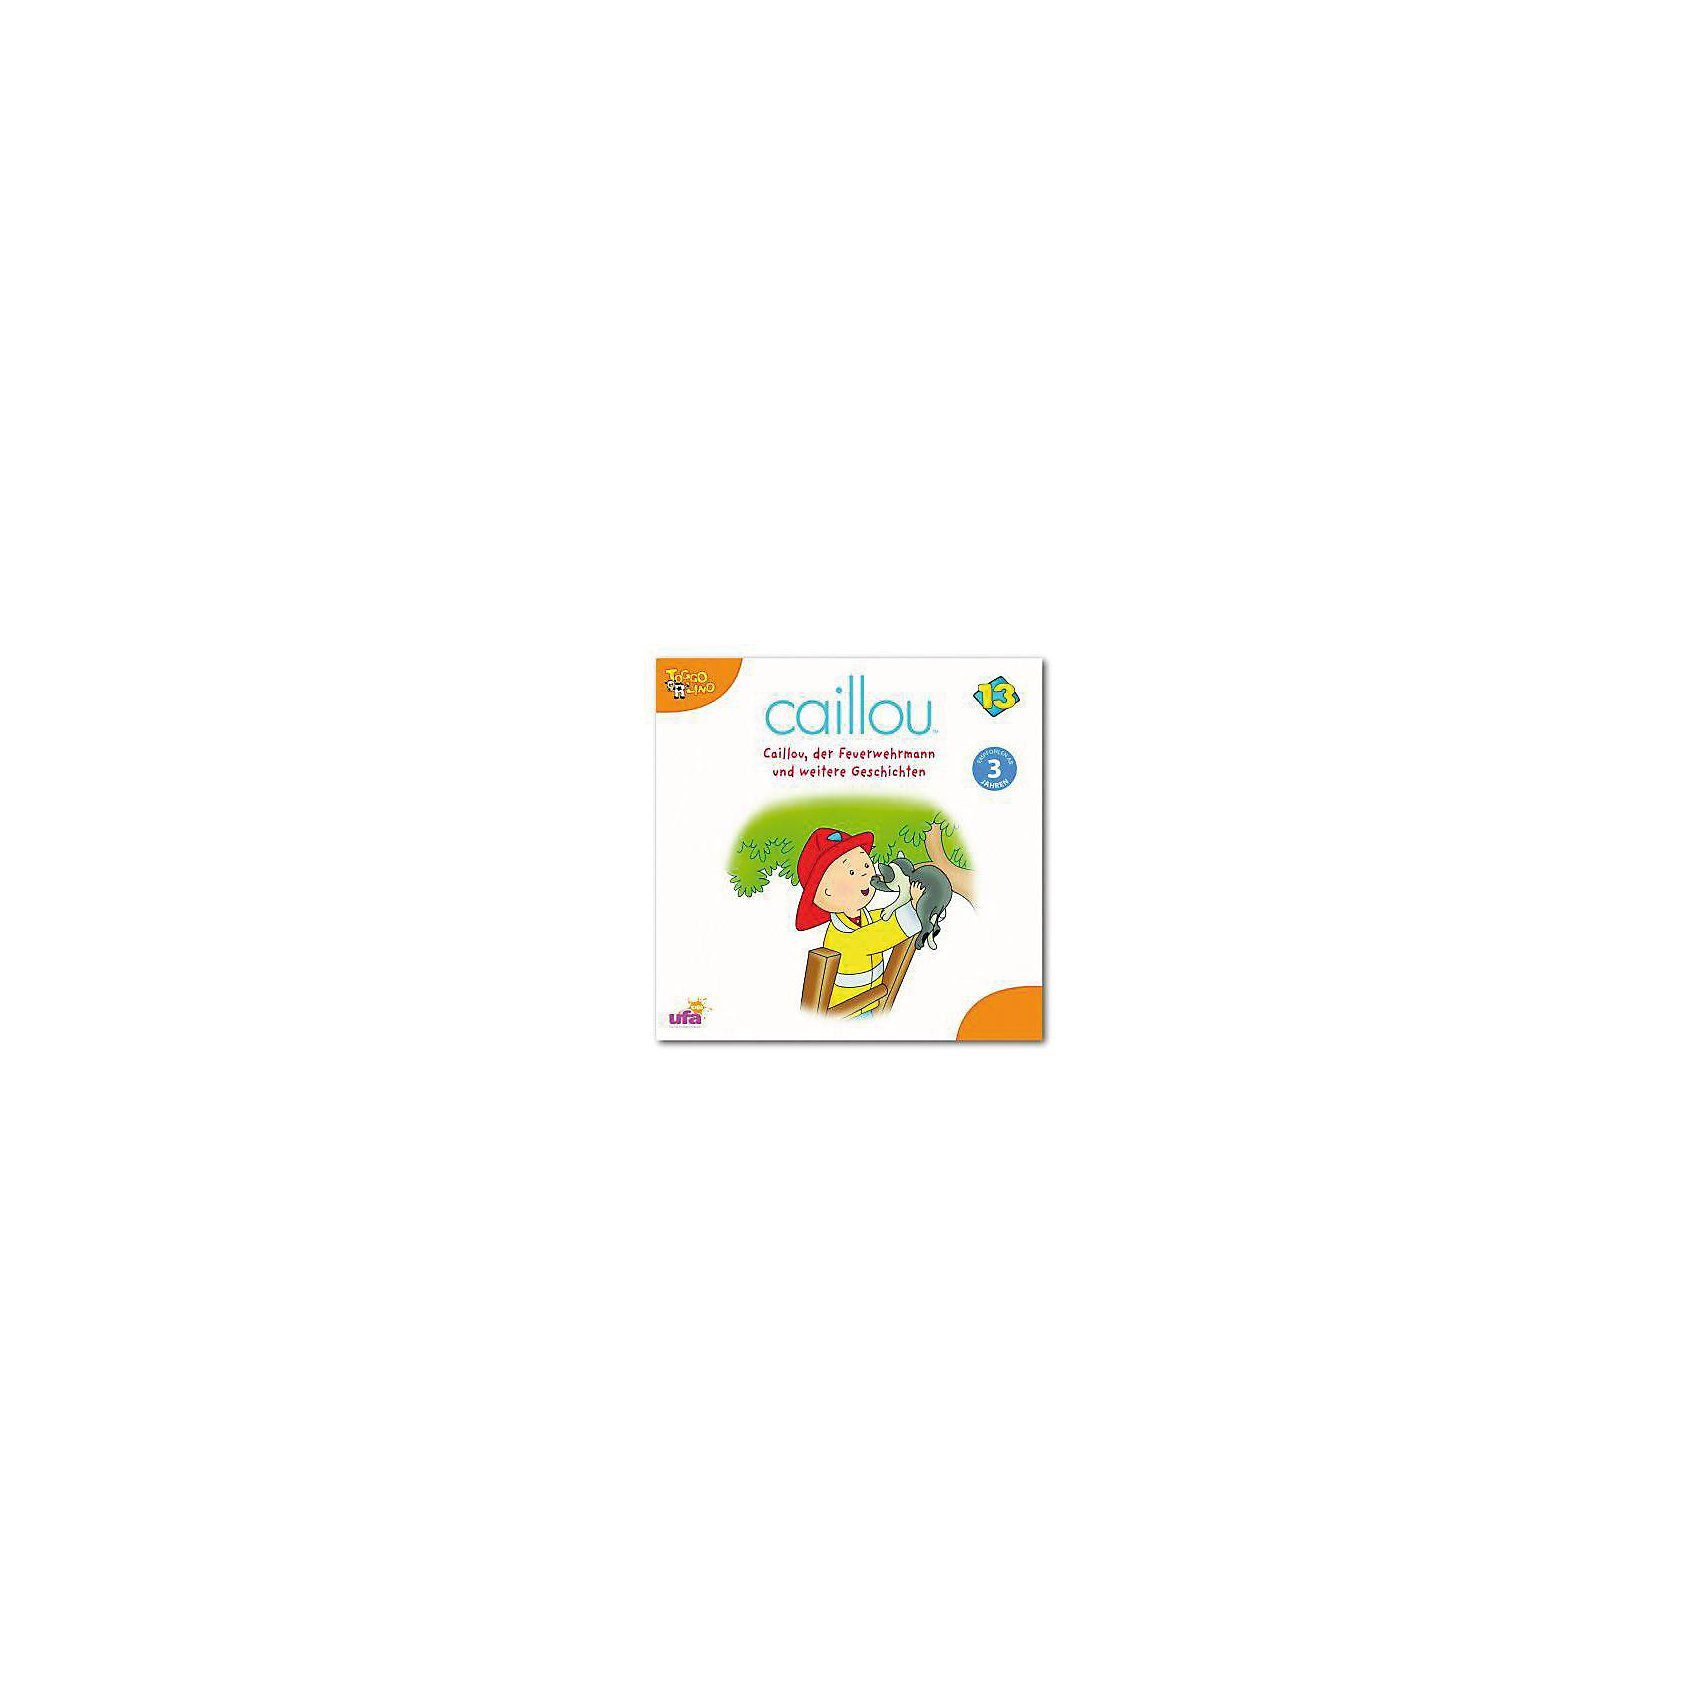 SONY BMG MUSIC CD Caillou 13 - Caillou der Feuerwehrmann